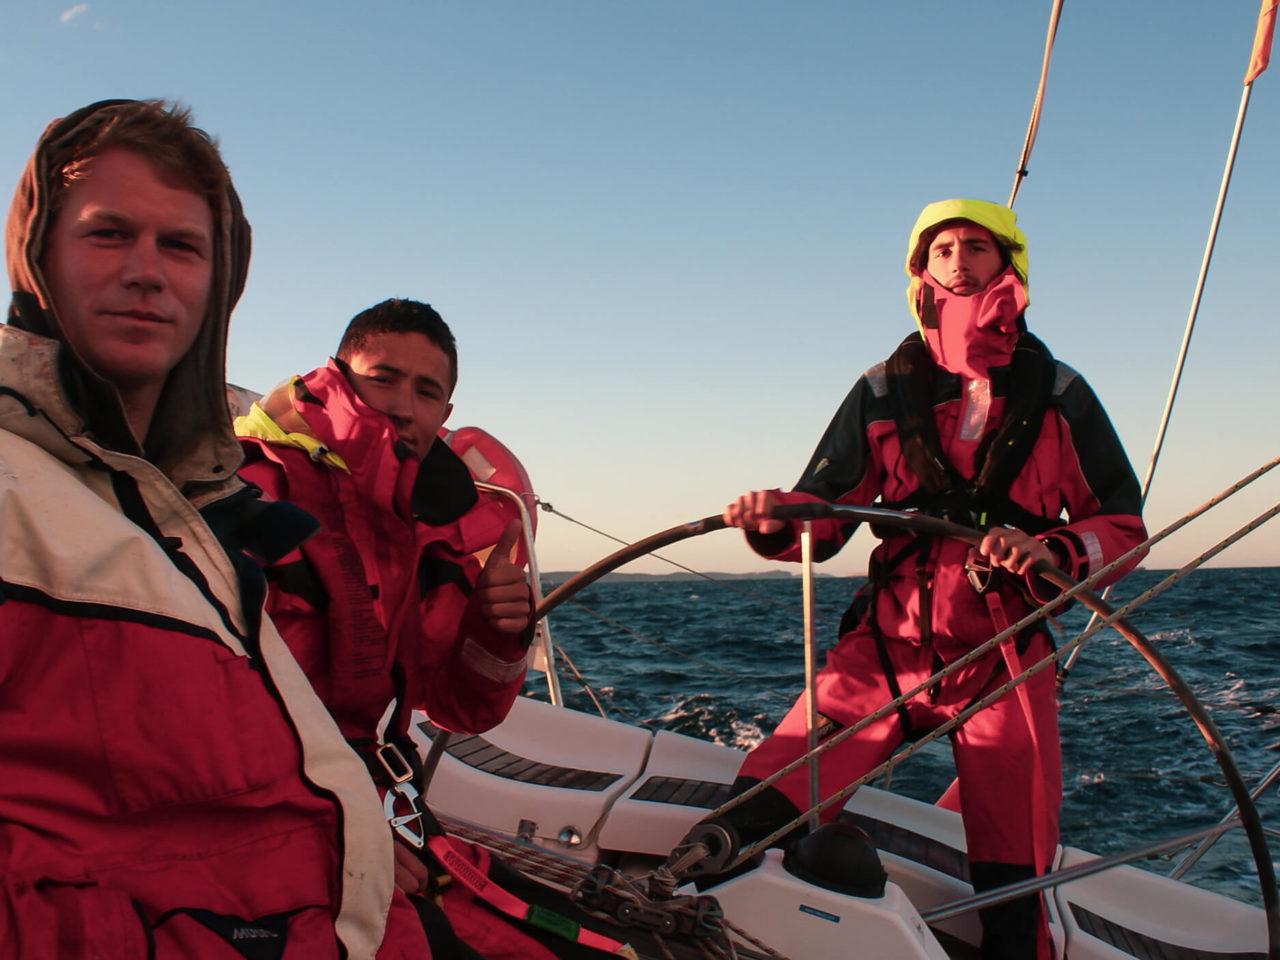 Flying-FIsh-Sailing--015